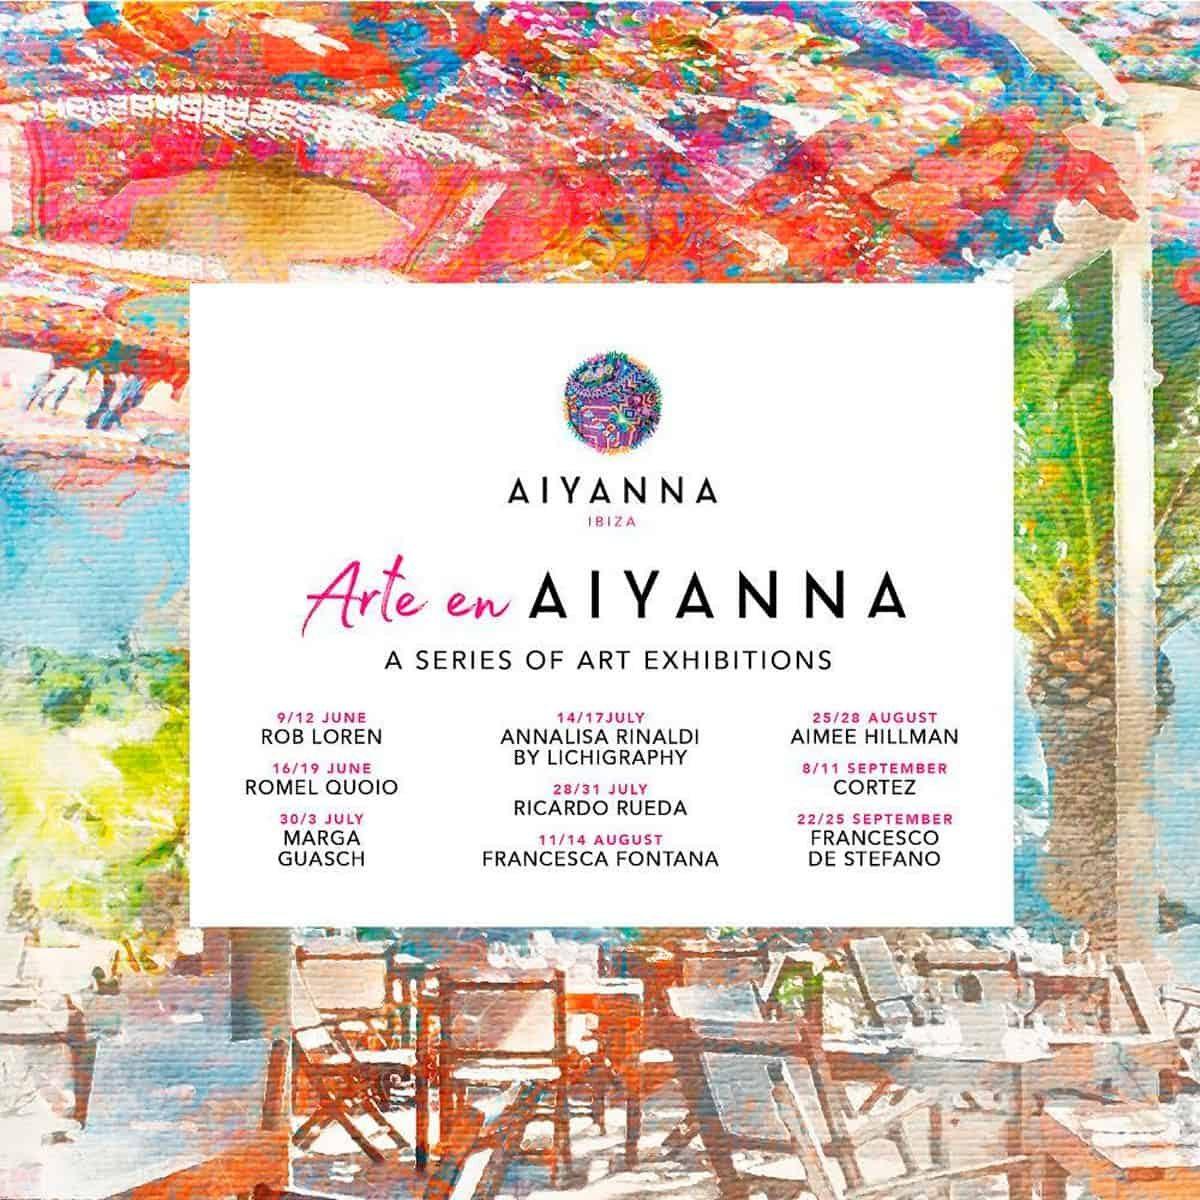 expositions-art-aiyanna-ibiza-2021-welcometoibiza